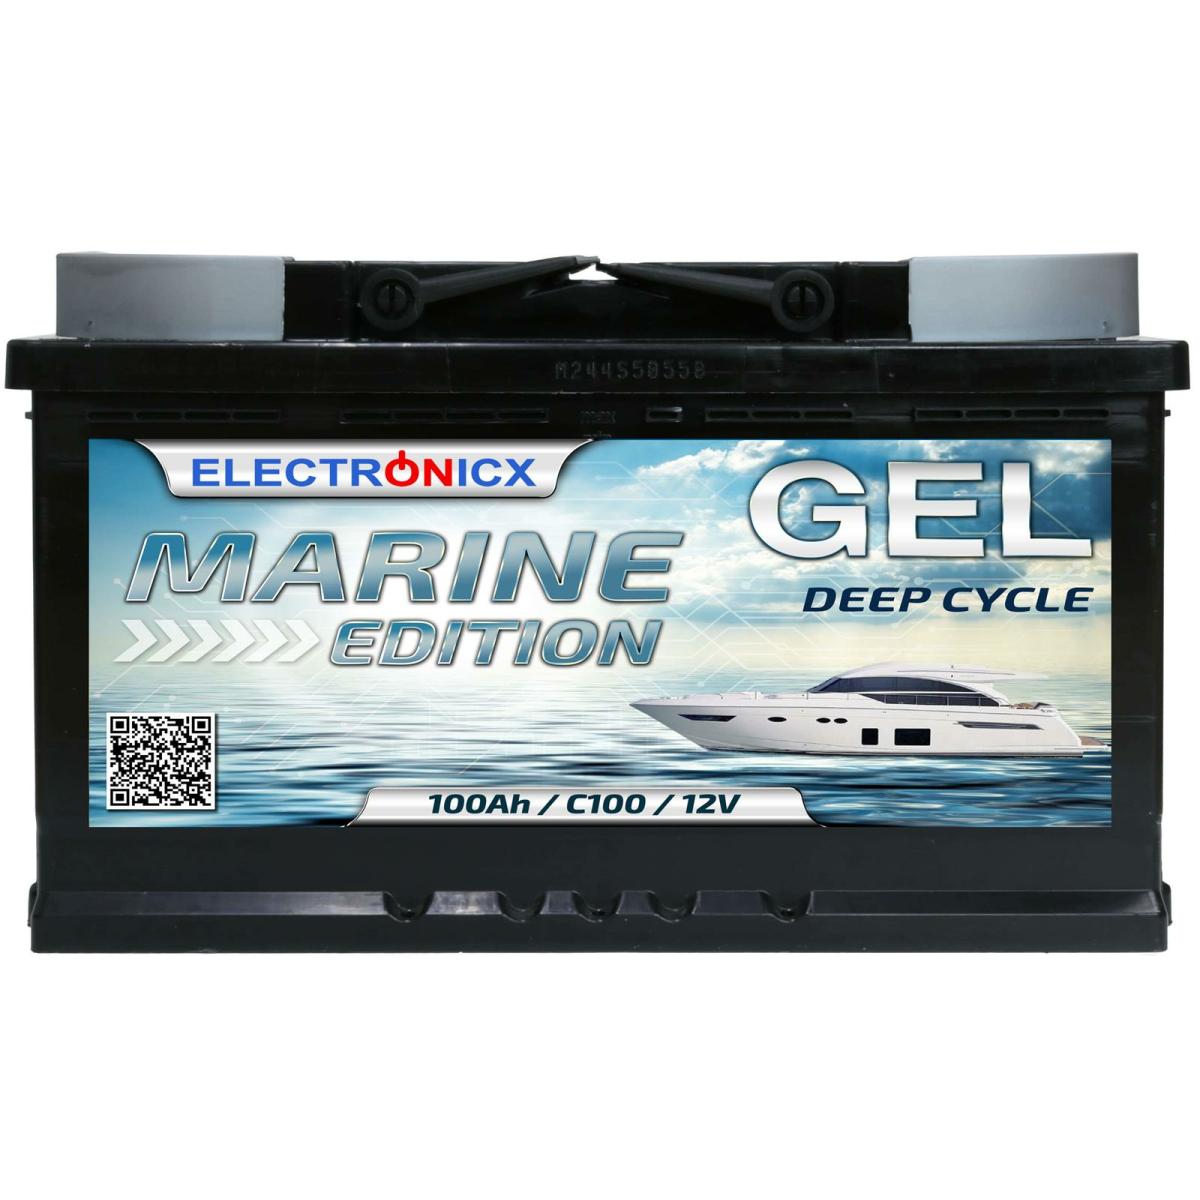 Electronicx Marine Edition GEL Batterie 100 AH 12V Boot Schiff Versorgungsbatterie